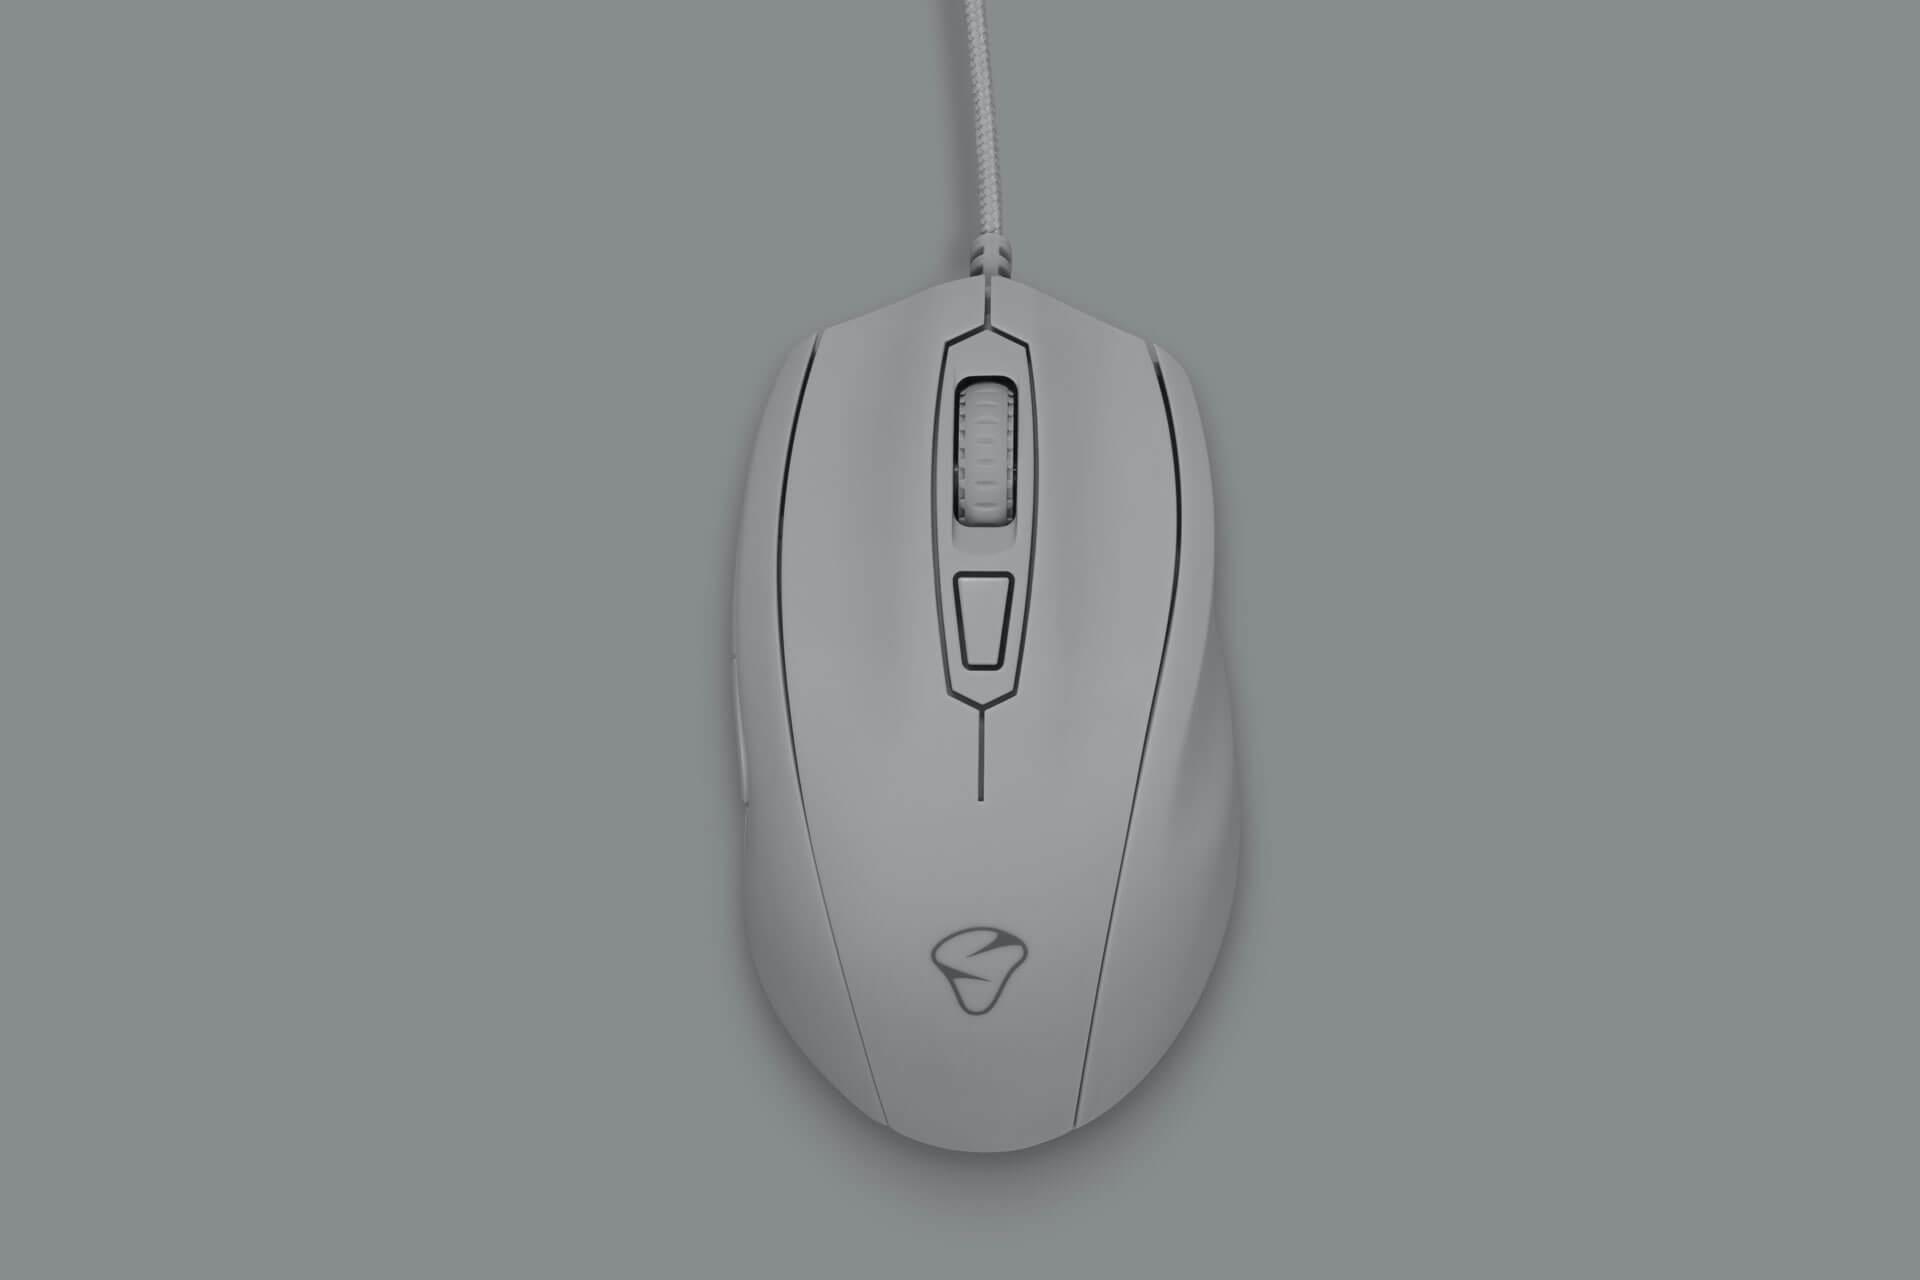 G Technology Thread 63748598 Razer Naga Chroma Gaming Mouse Kode Mosx 14 View Samegoogleimgopsiqdbsaucenao Castor Shark Fin Top